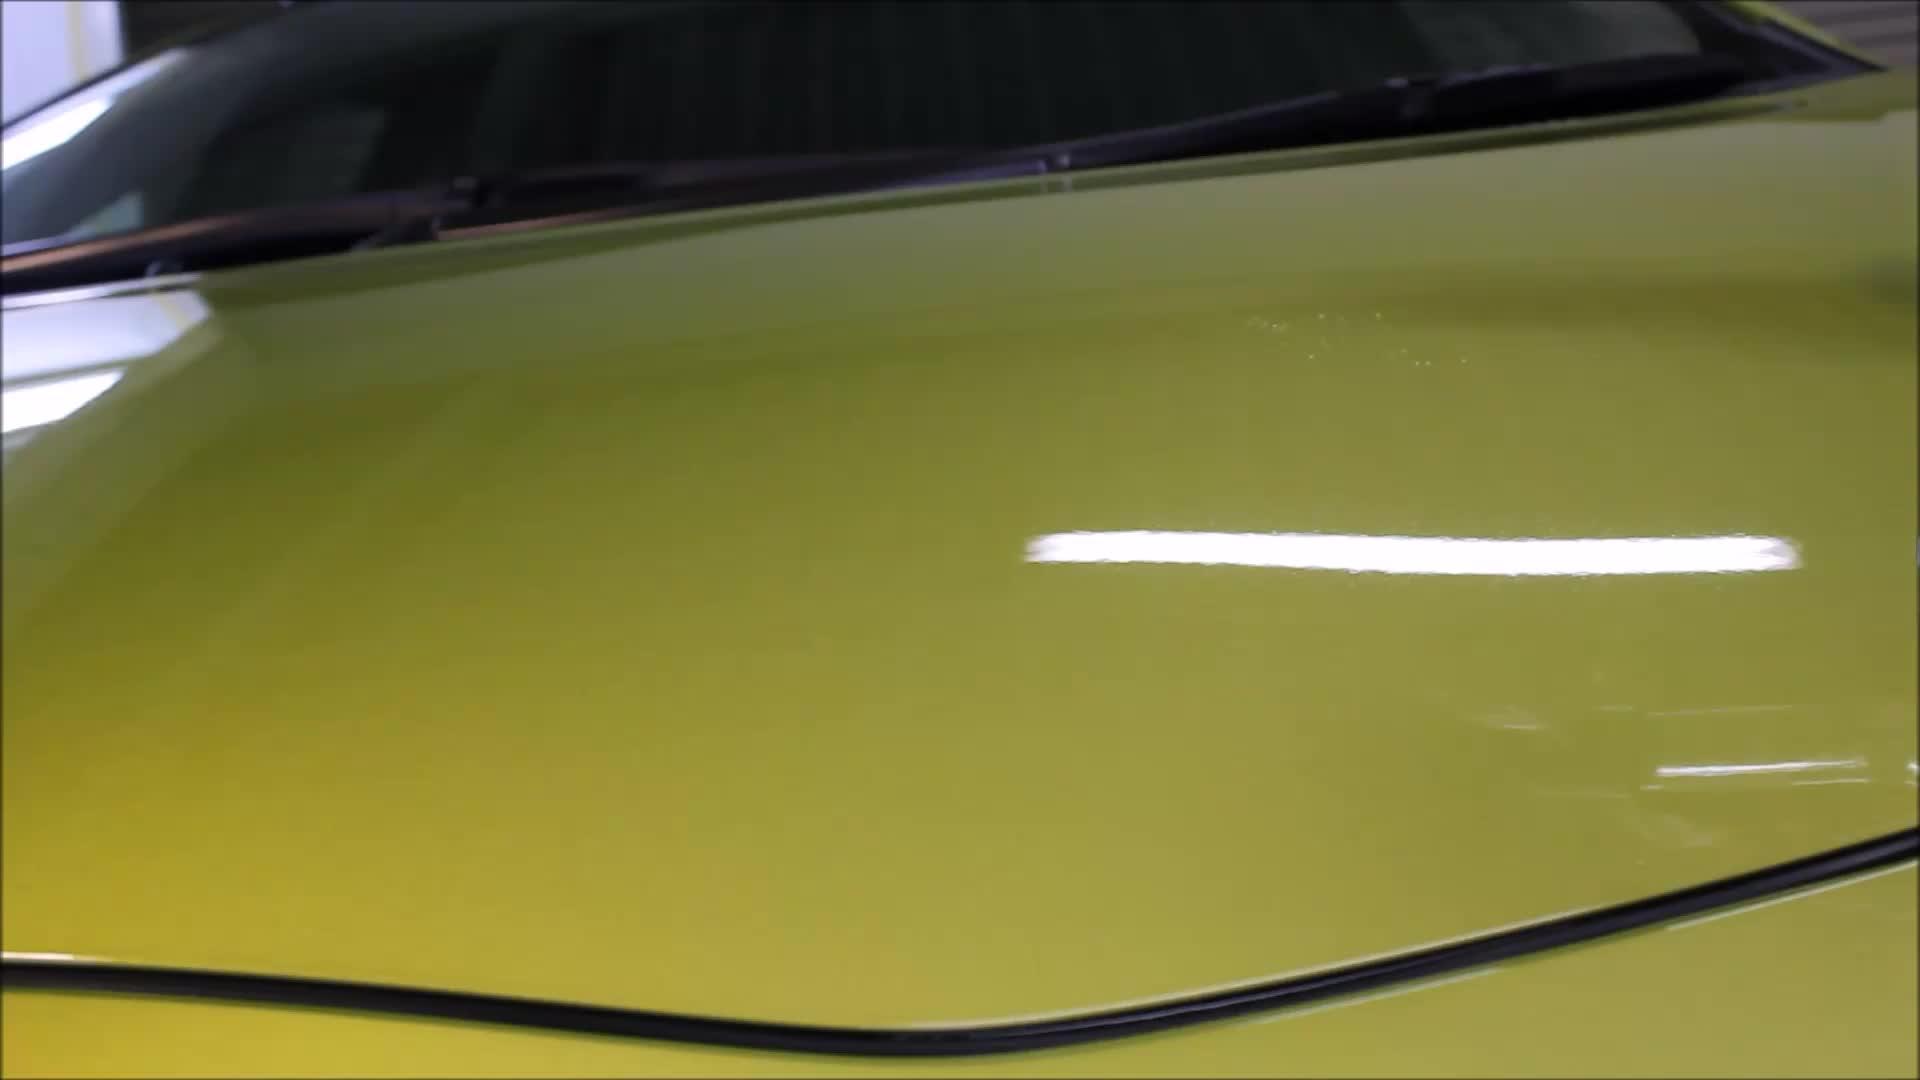 Car Body Glass Shiny Schutzmittel-Kit Flüssige Beschichtung Keramik